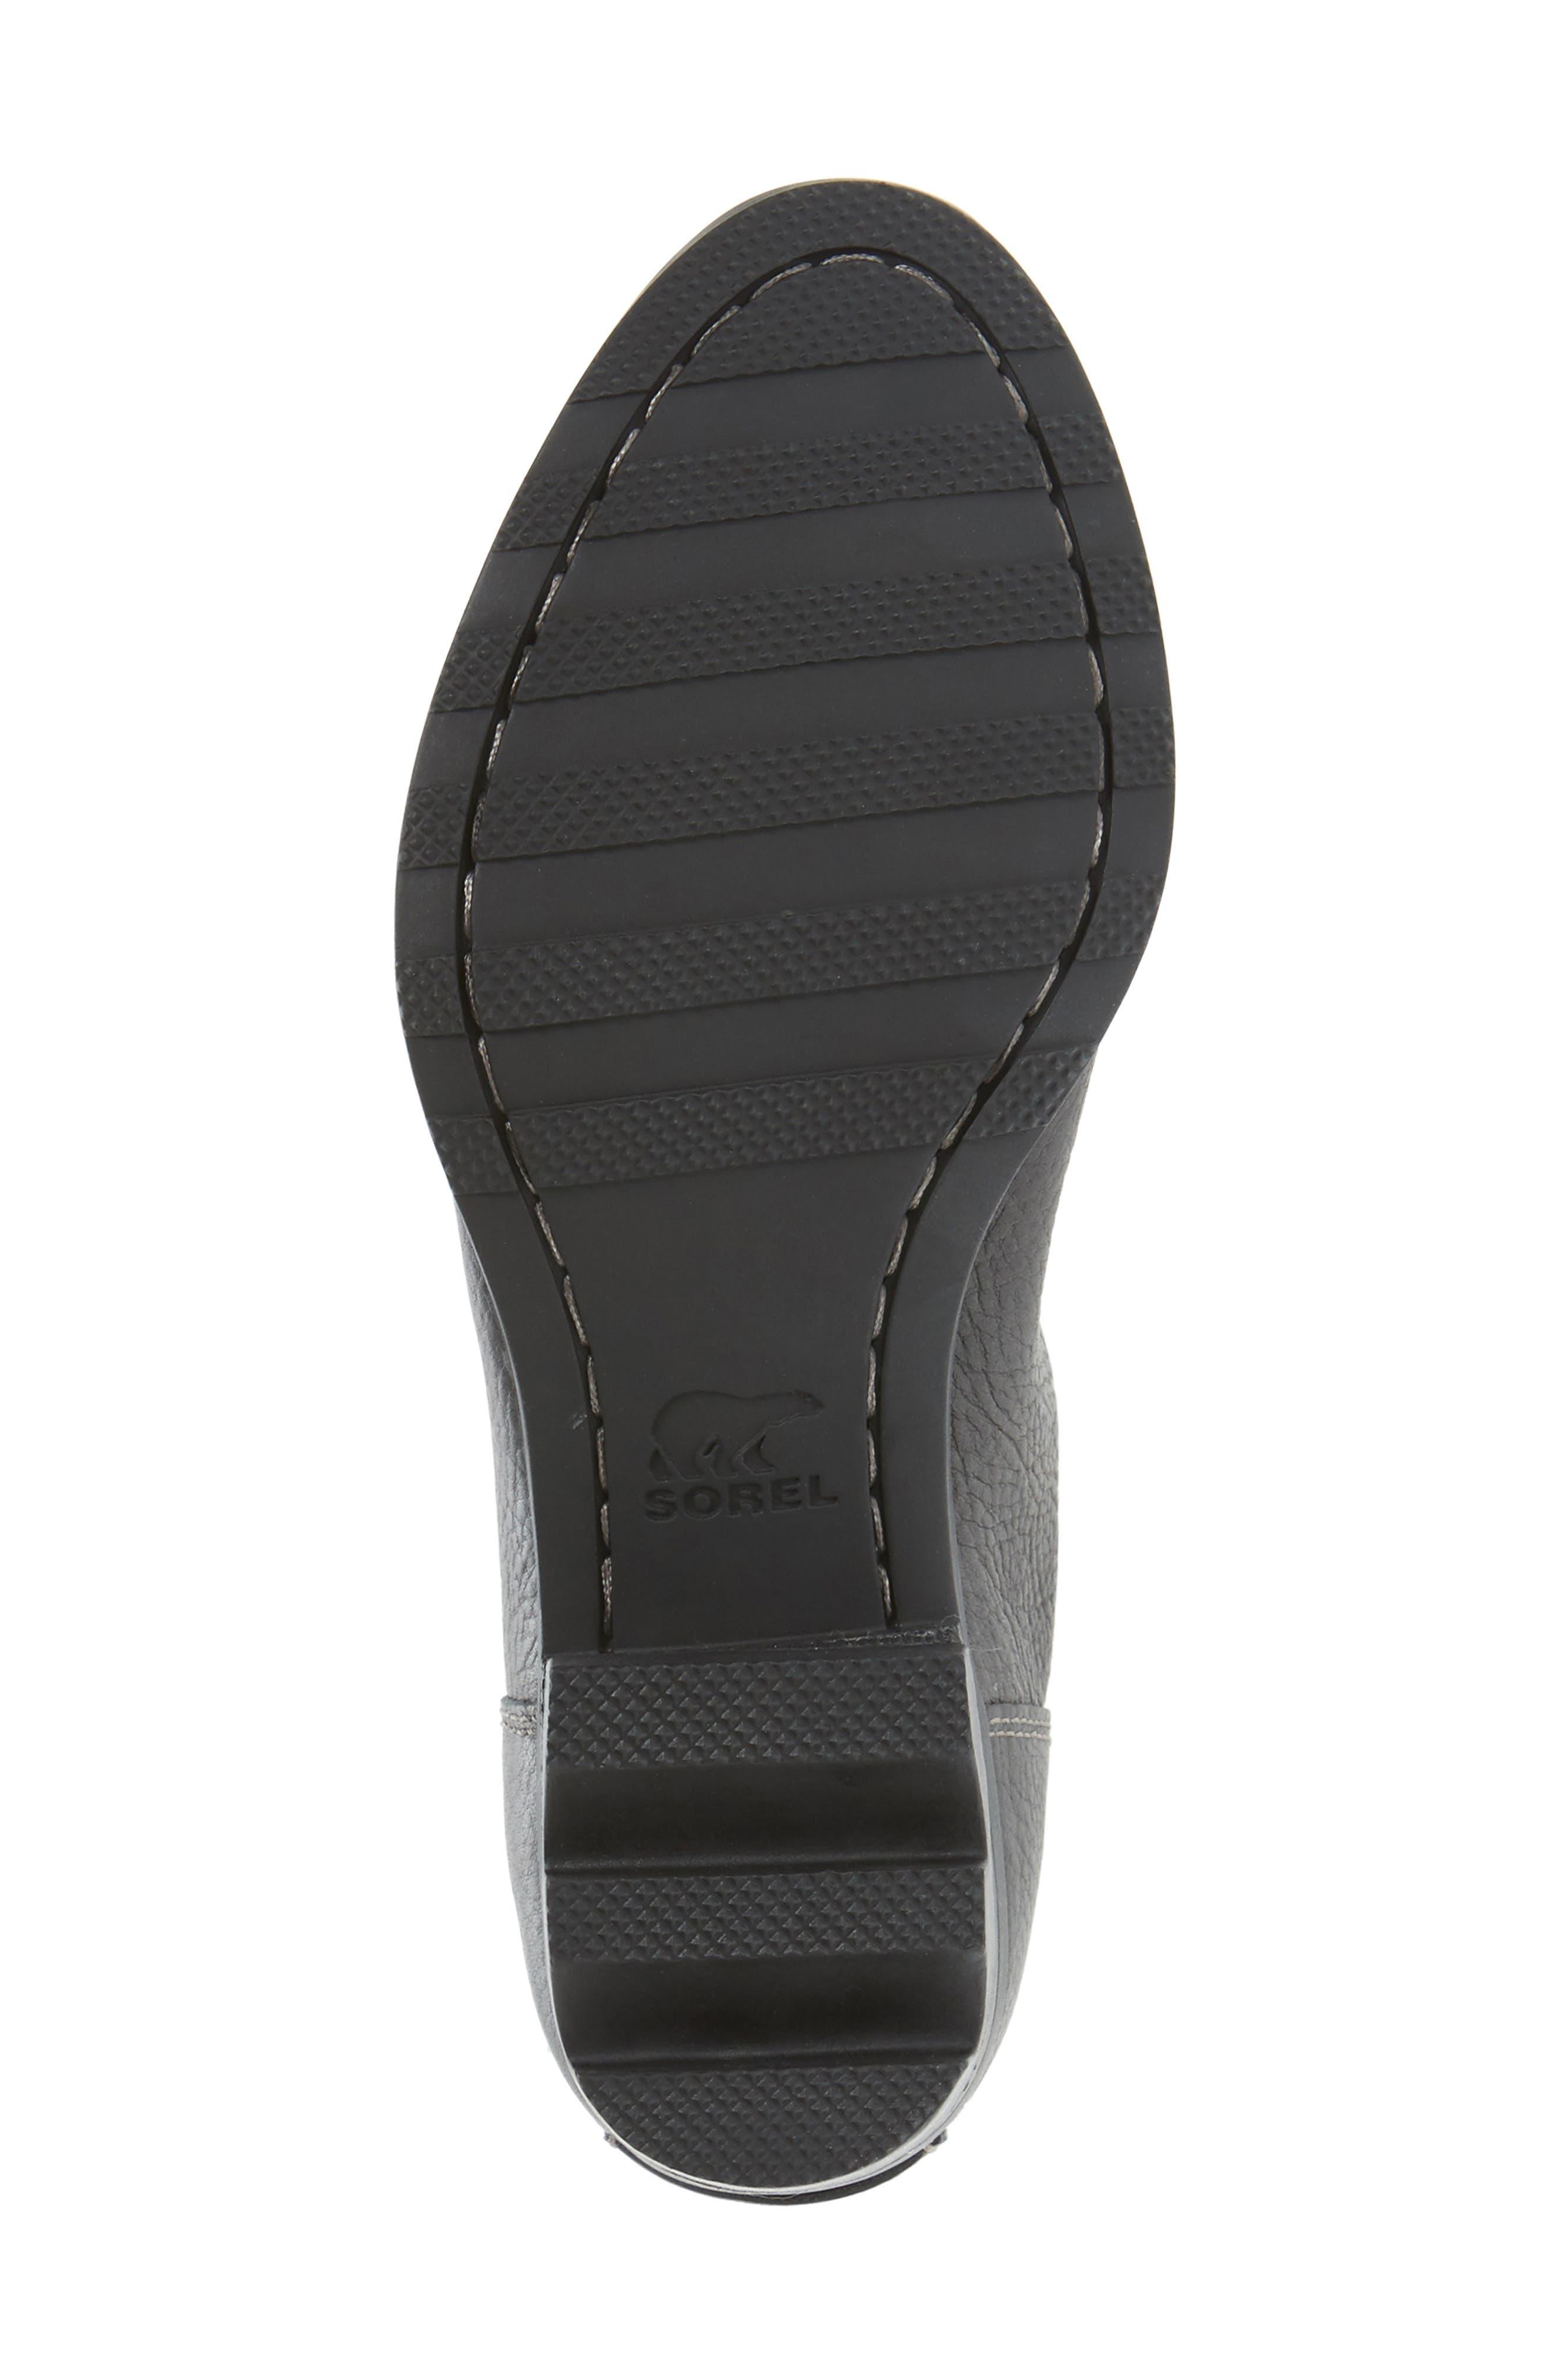 Danica Waterproof Knee High Boot,                             Alternate thumbnail 6, color,                             Quarry/ Black